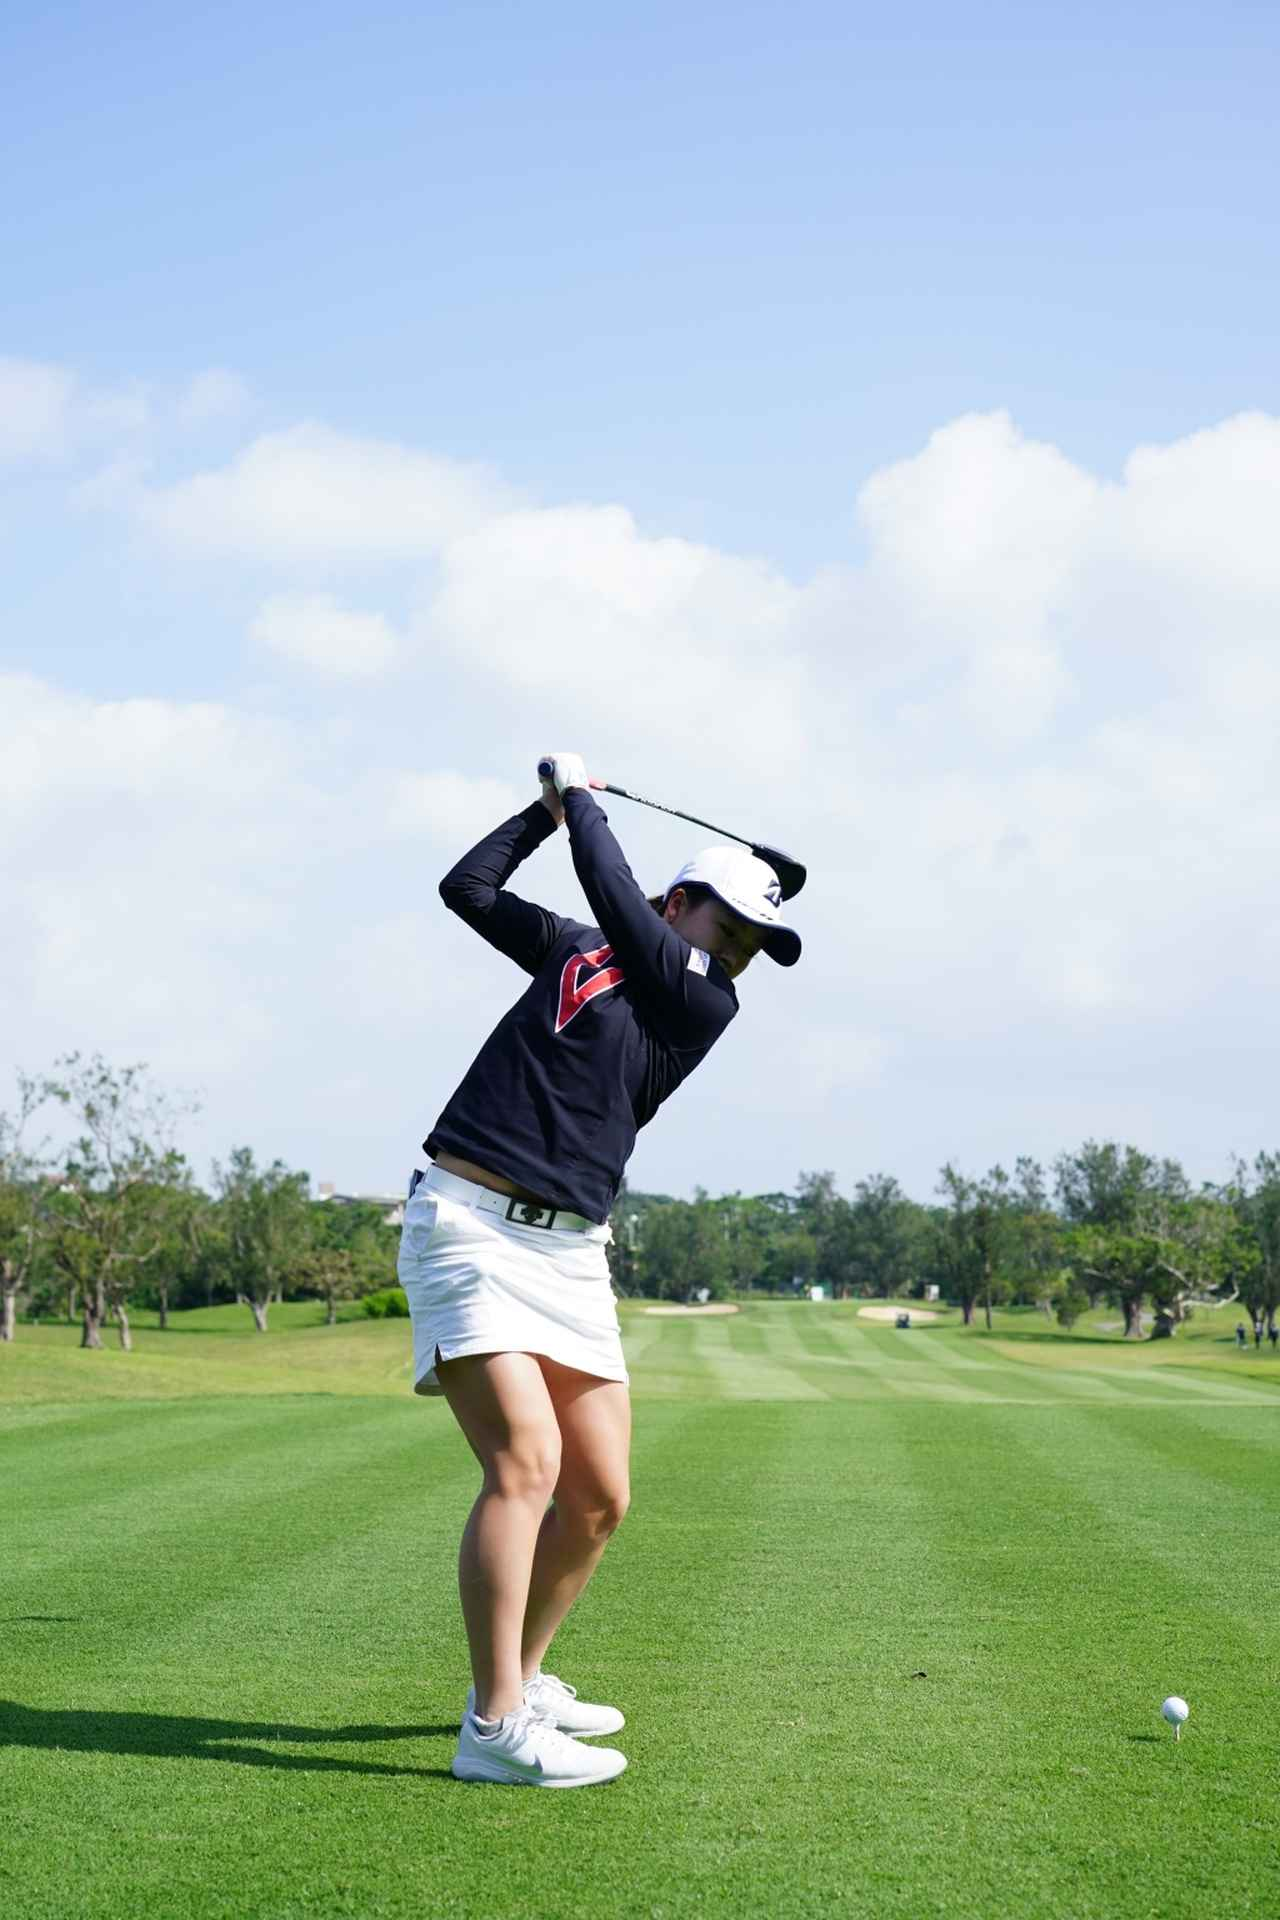 Images : 8番目の画像 - 丹萌乃のドライバー連続写真 - みんなのゴルフダイジェスト